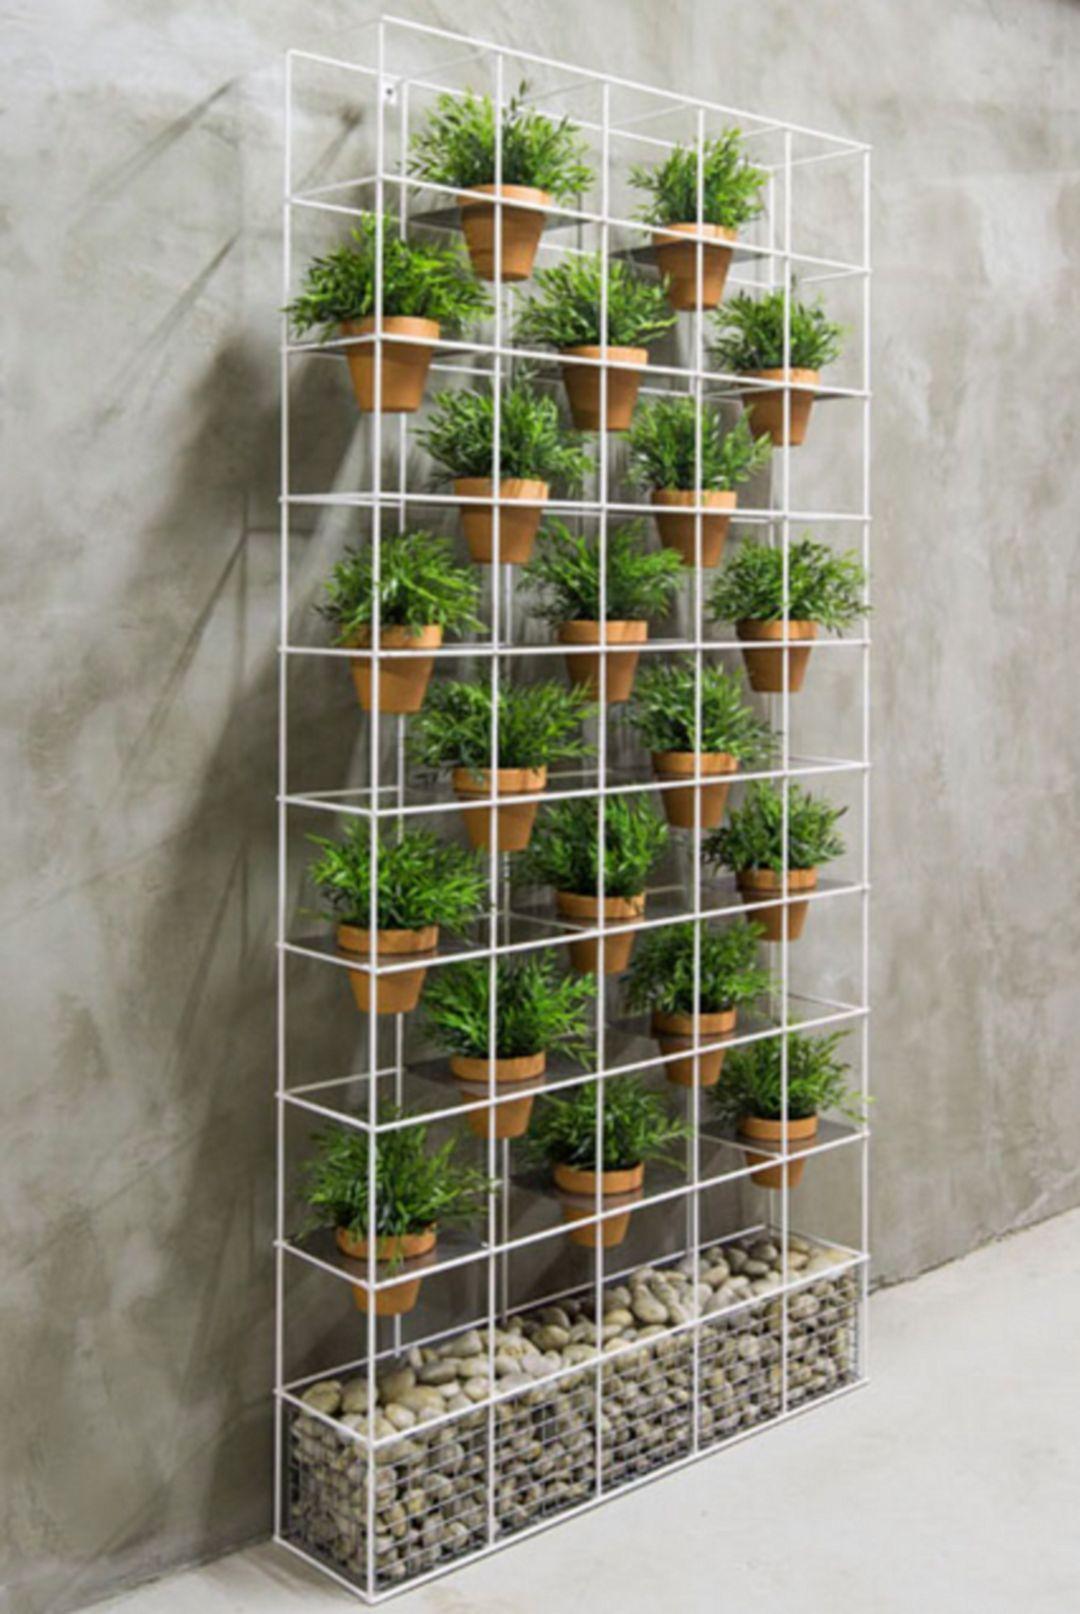 125 Stunning Vertical Garden Ideas To Make Your Home Fresh And Cool Vertical Garden Diy Vertical Garden Design Vertical Garden Wall